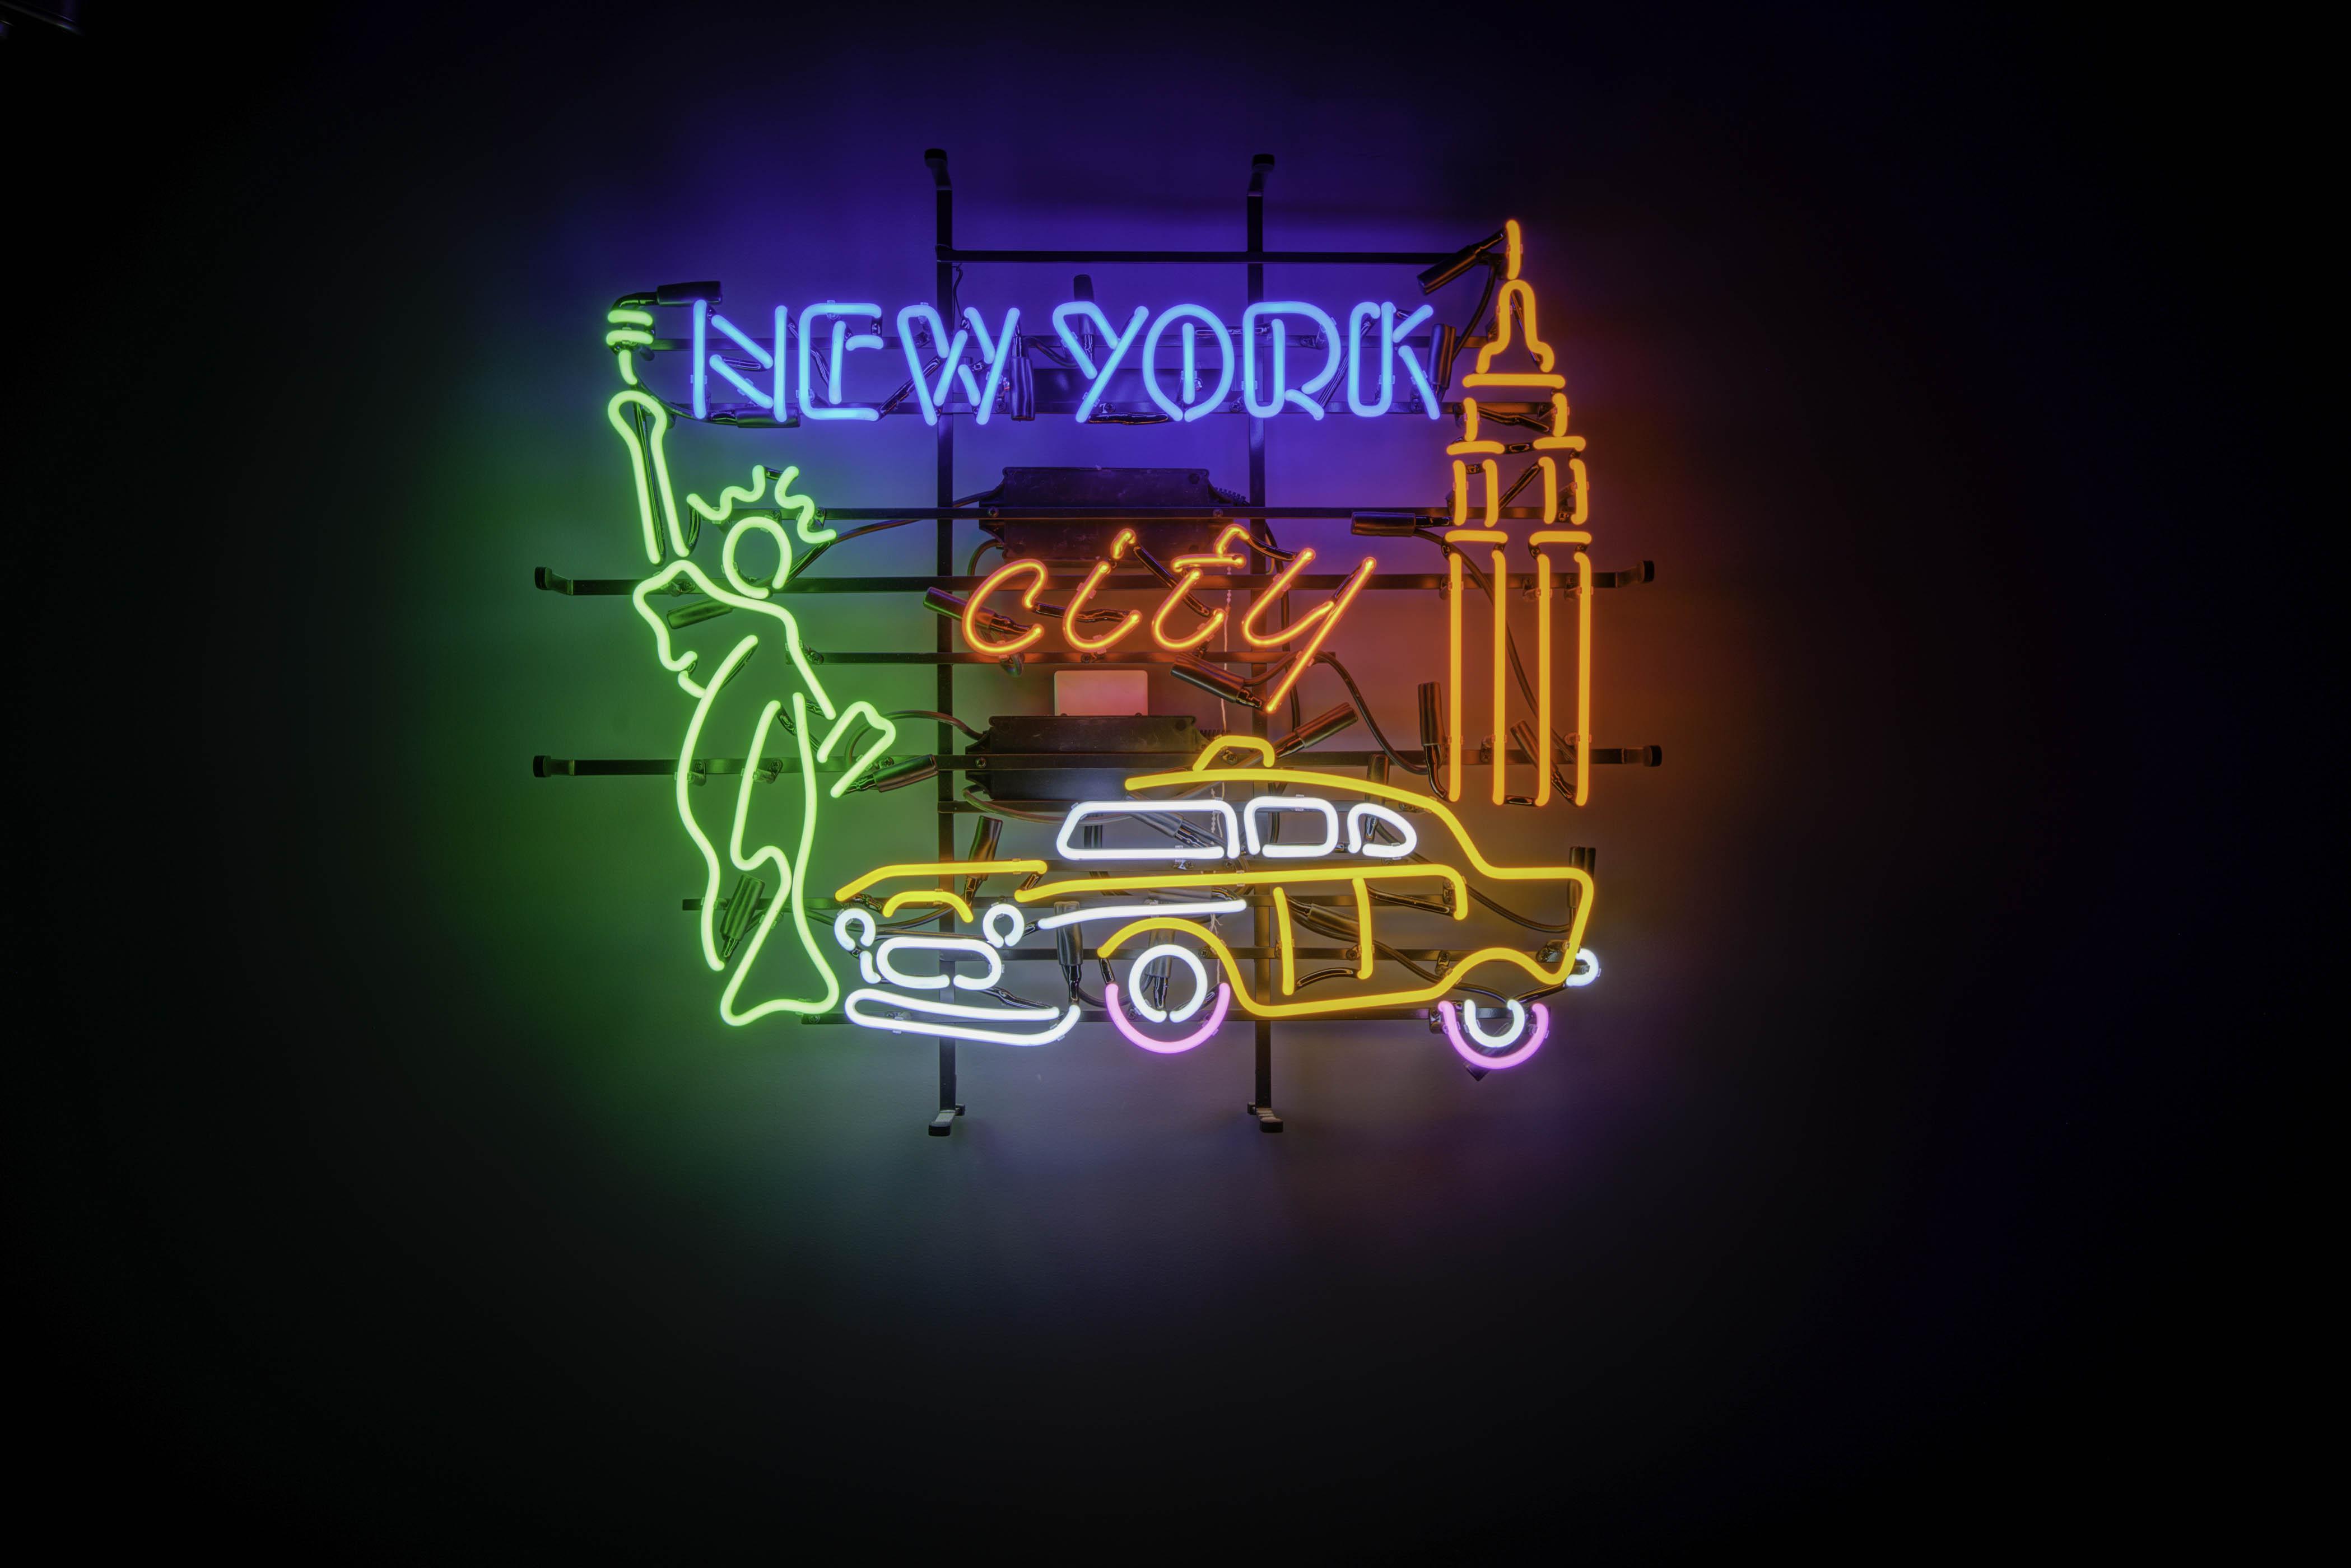 Eclairage d'ambiance du box New York du Karioka, néon